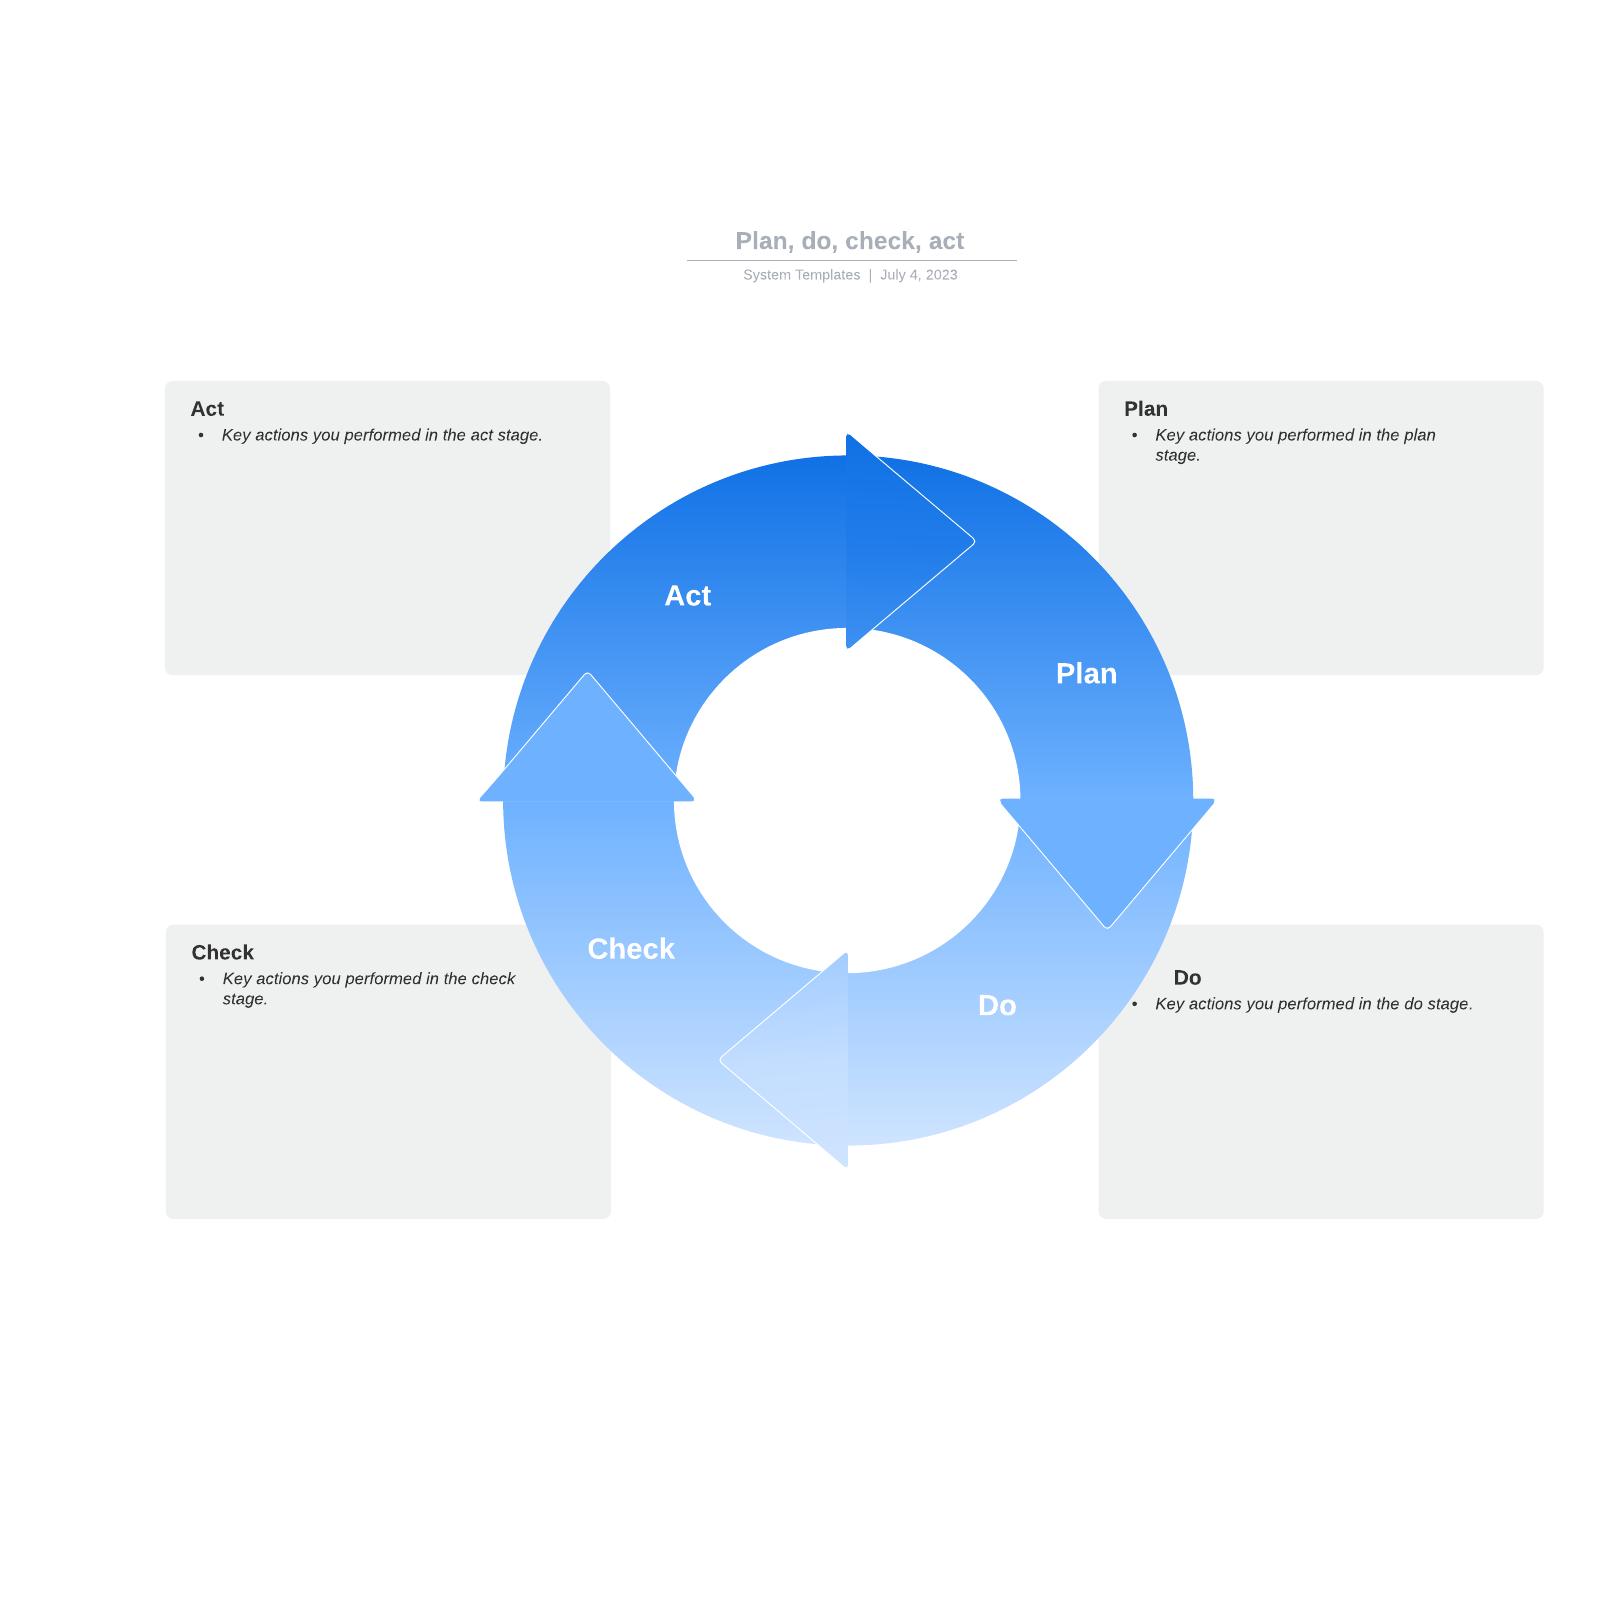 PDCA (Plan, Do, Check, Act) cycle